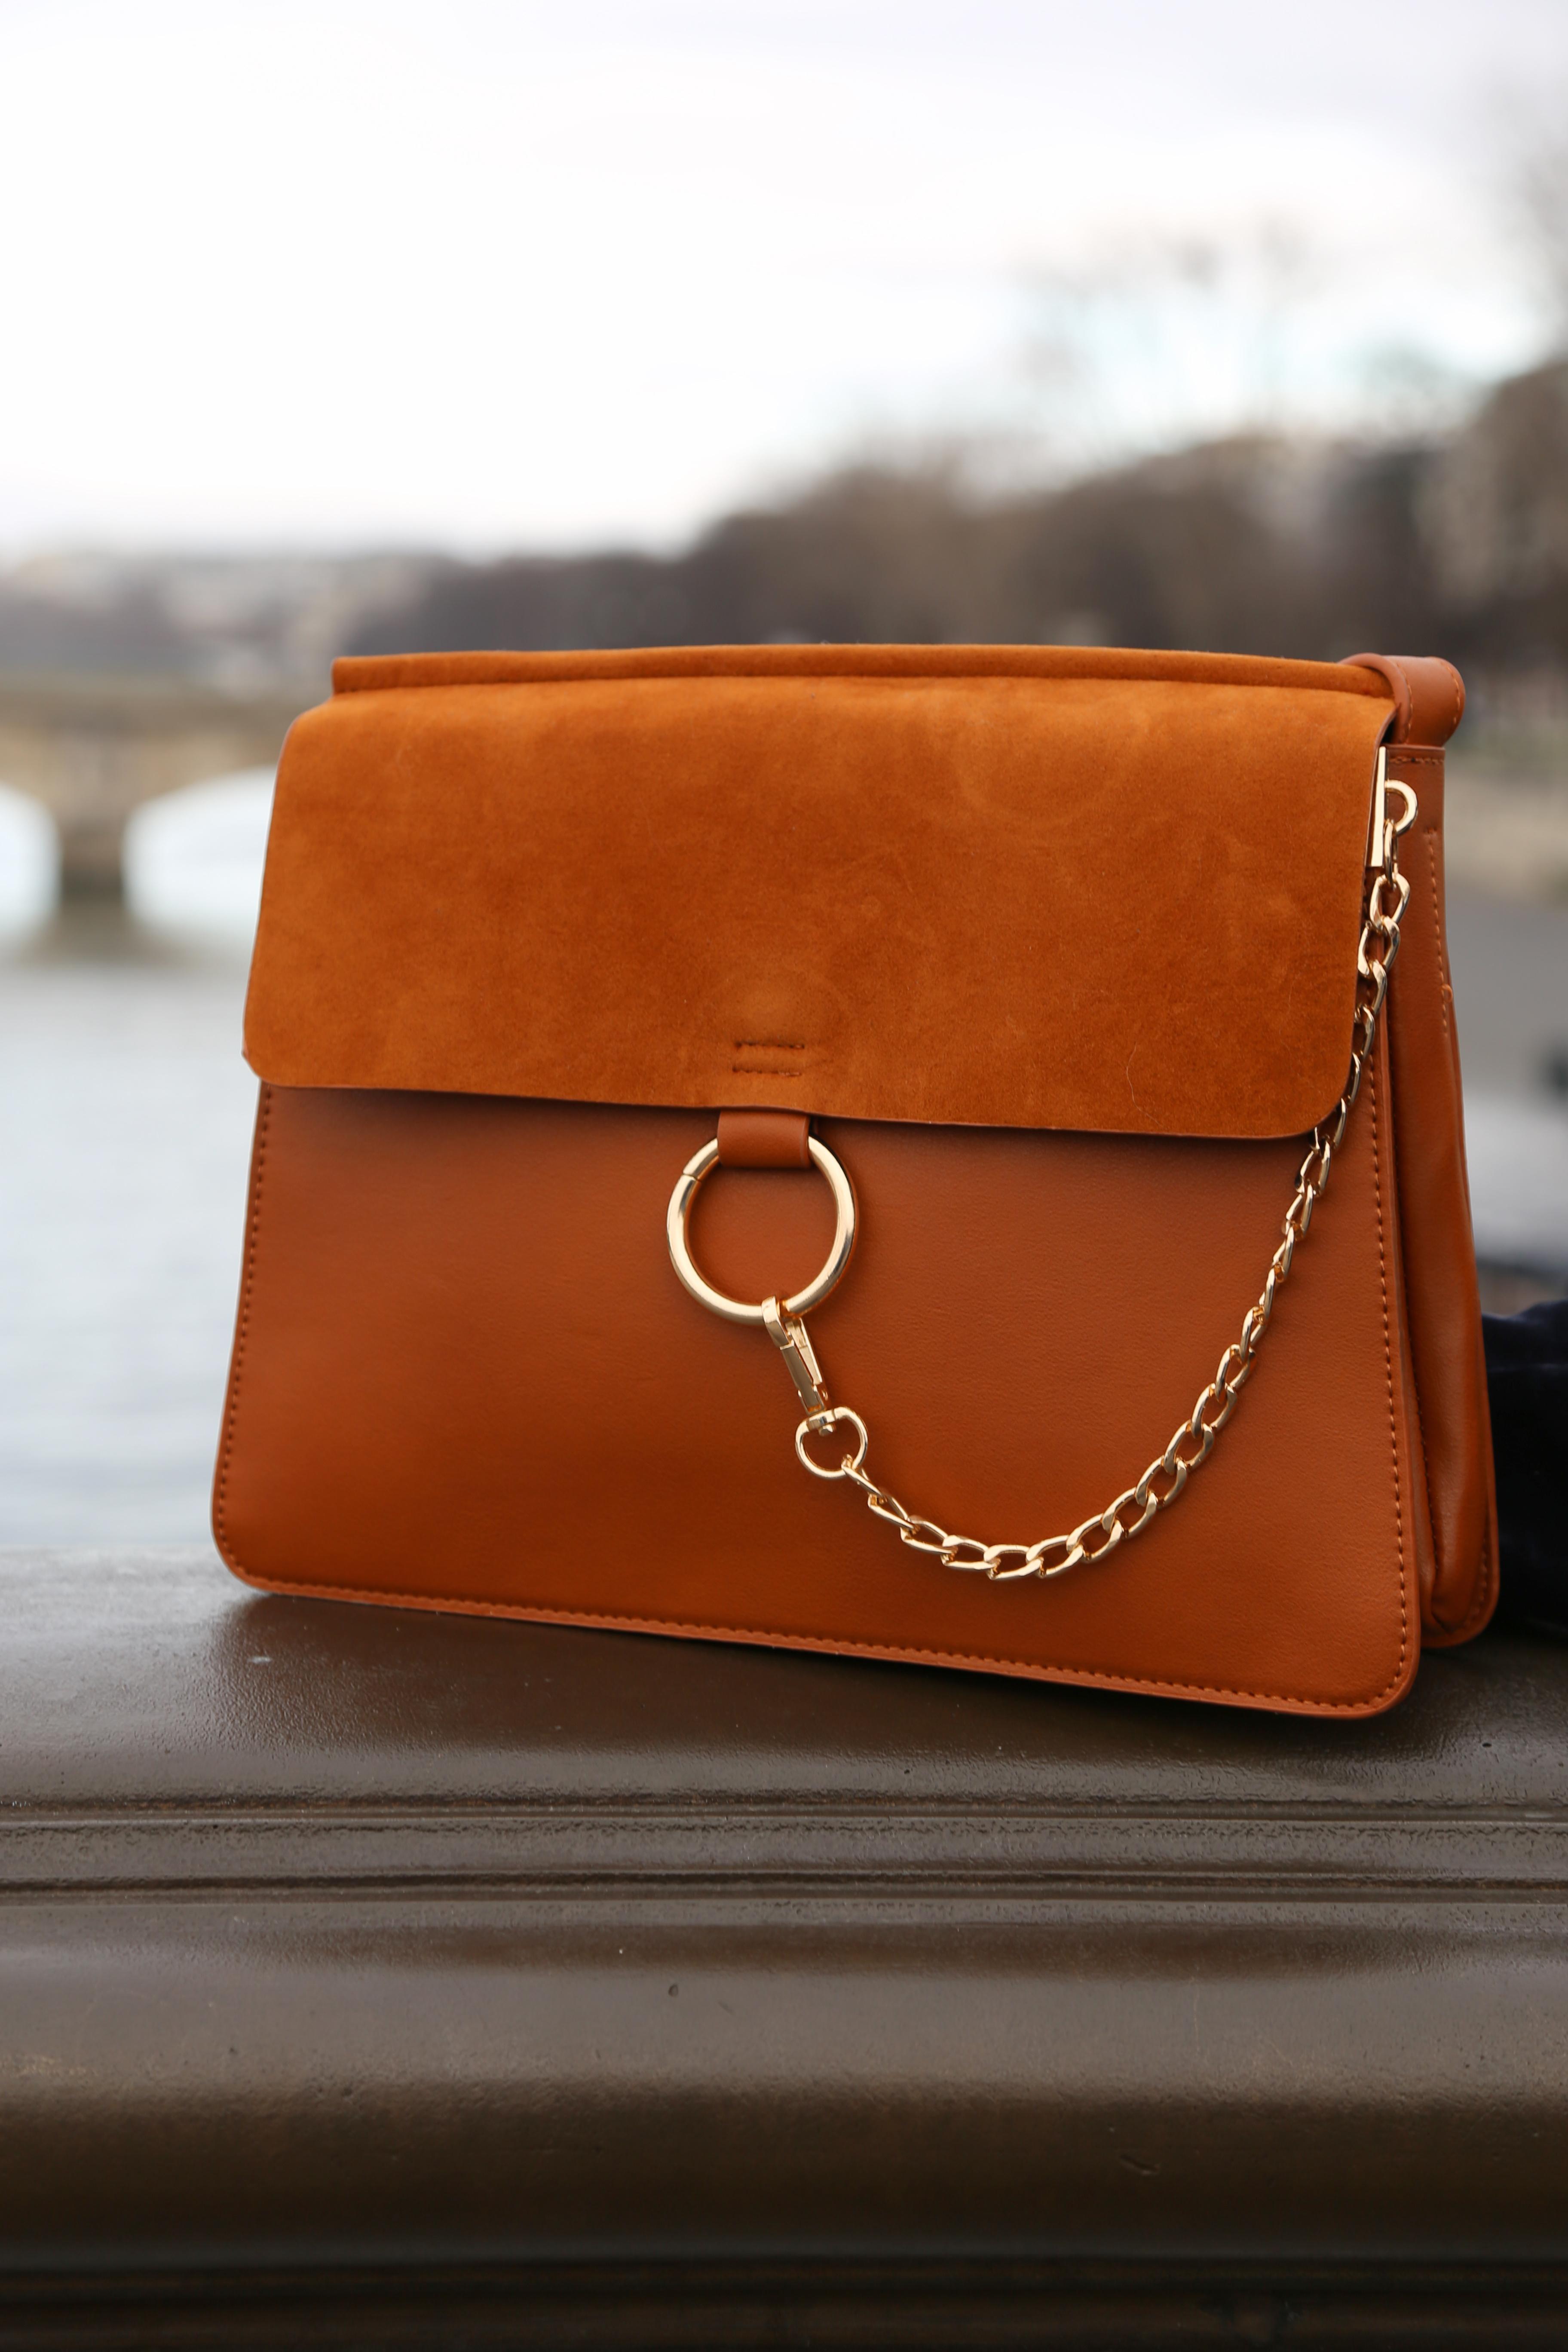 sac-faye-chloe-fashionblogger-influencer-seralynepointcom-paris-img_0083